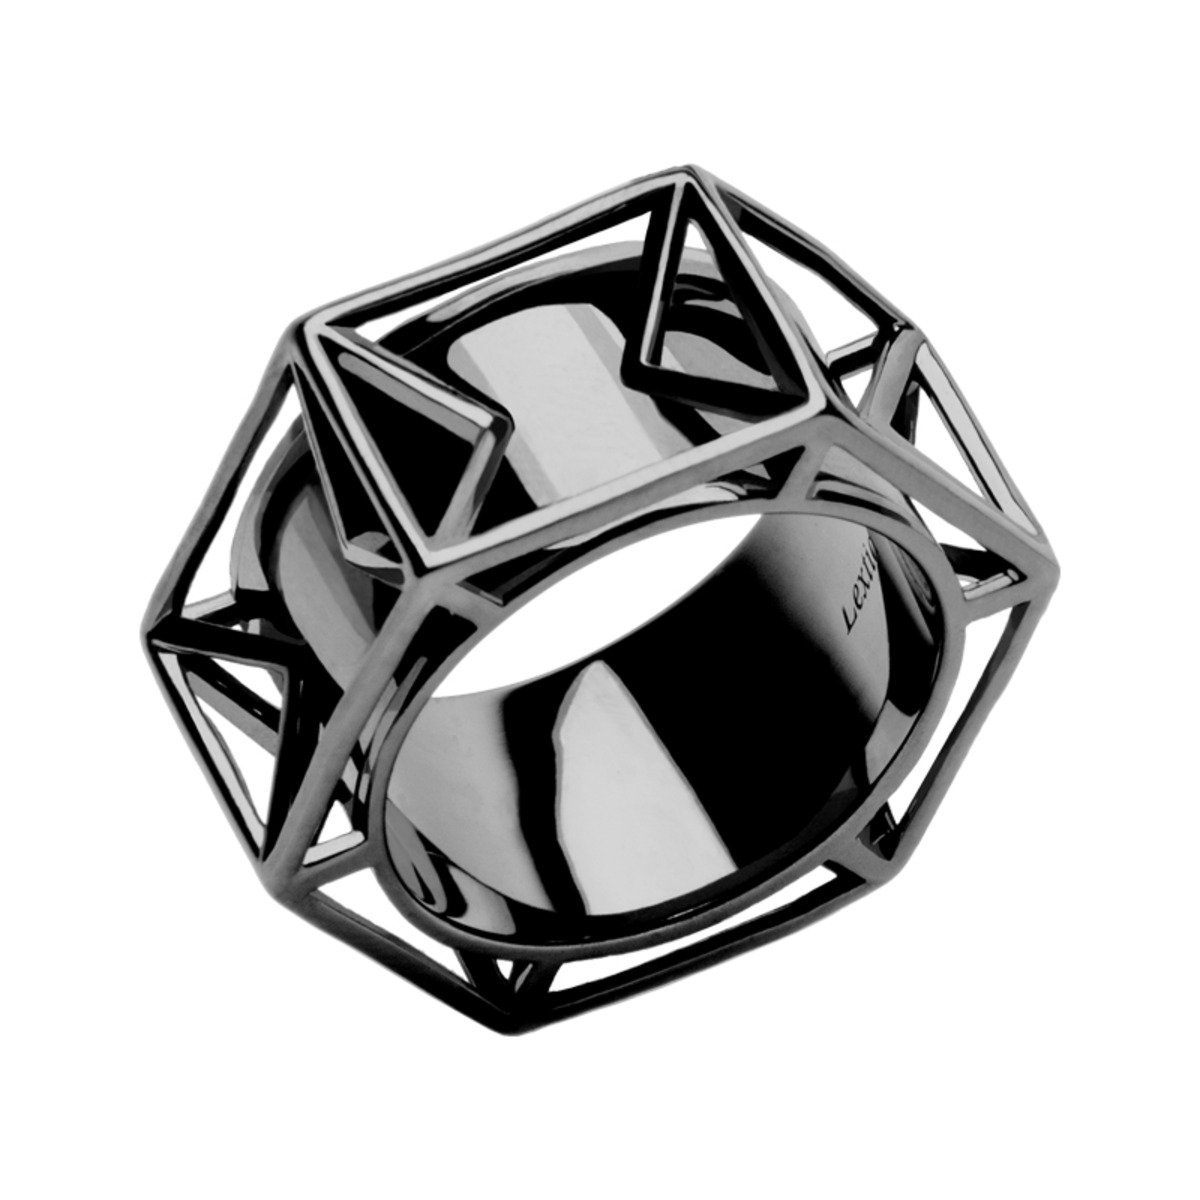 Icosahedron 925 純銀 戒指